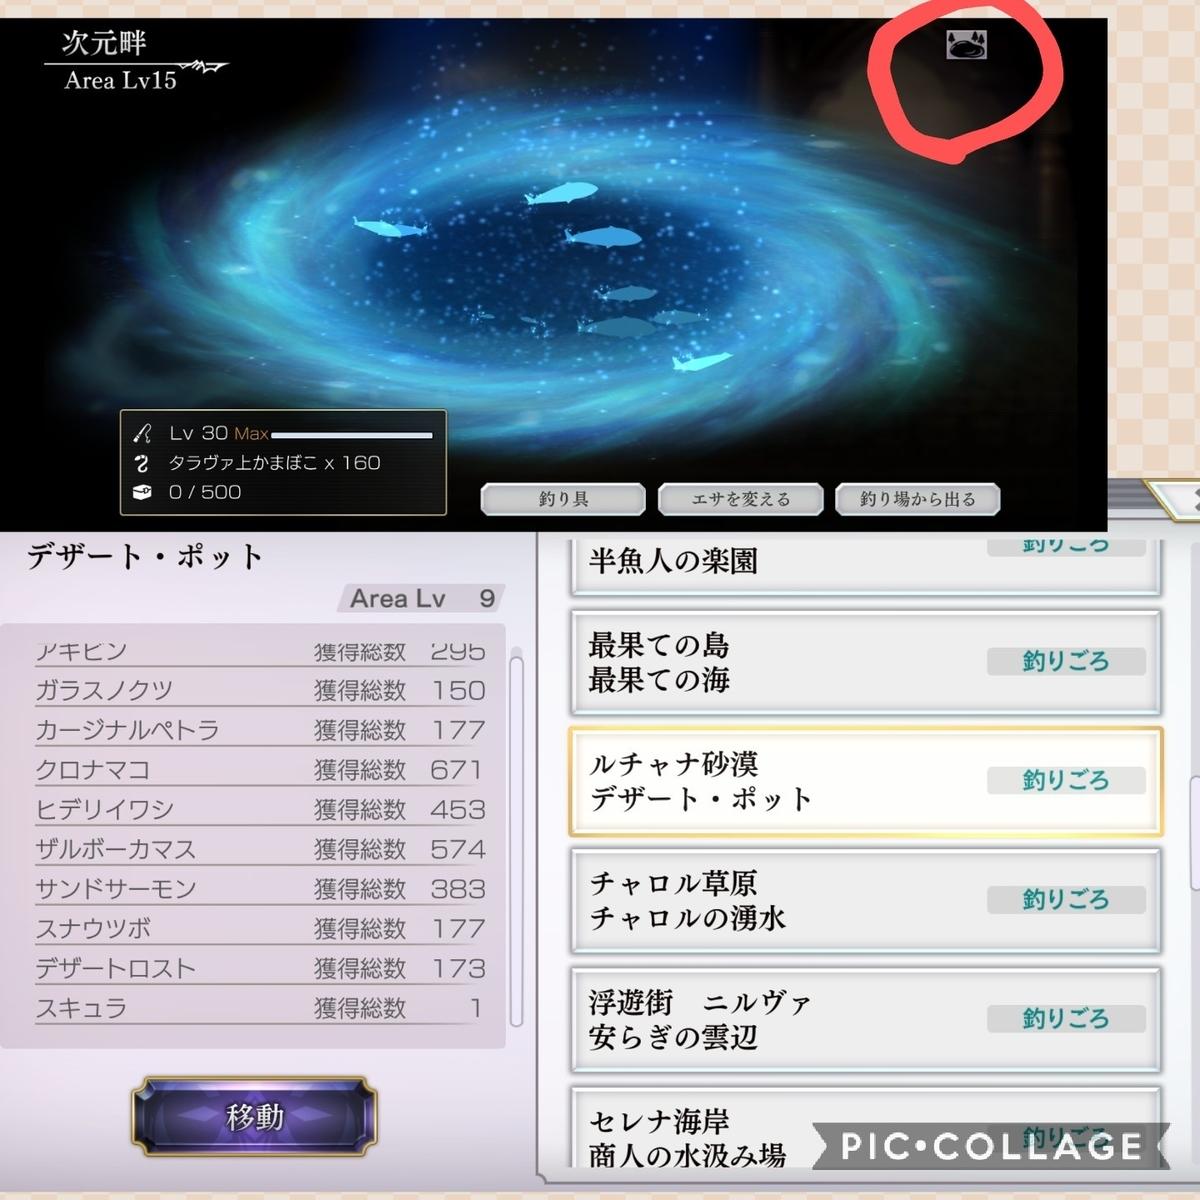 f:id:shion_poke:20210819213015j:plain